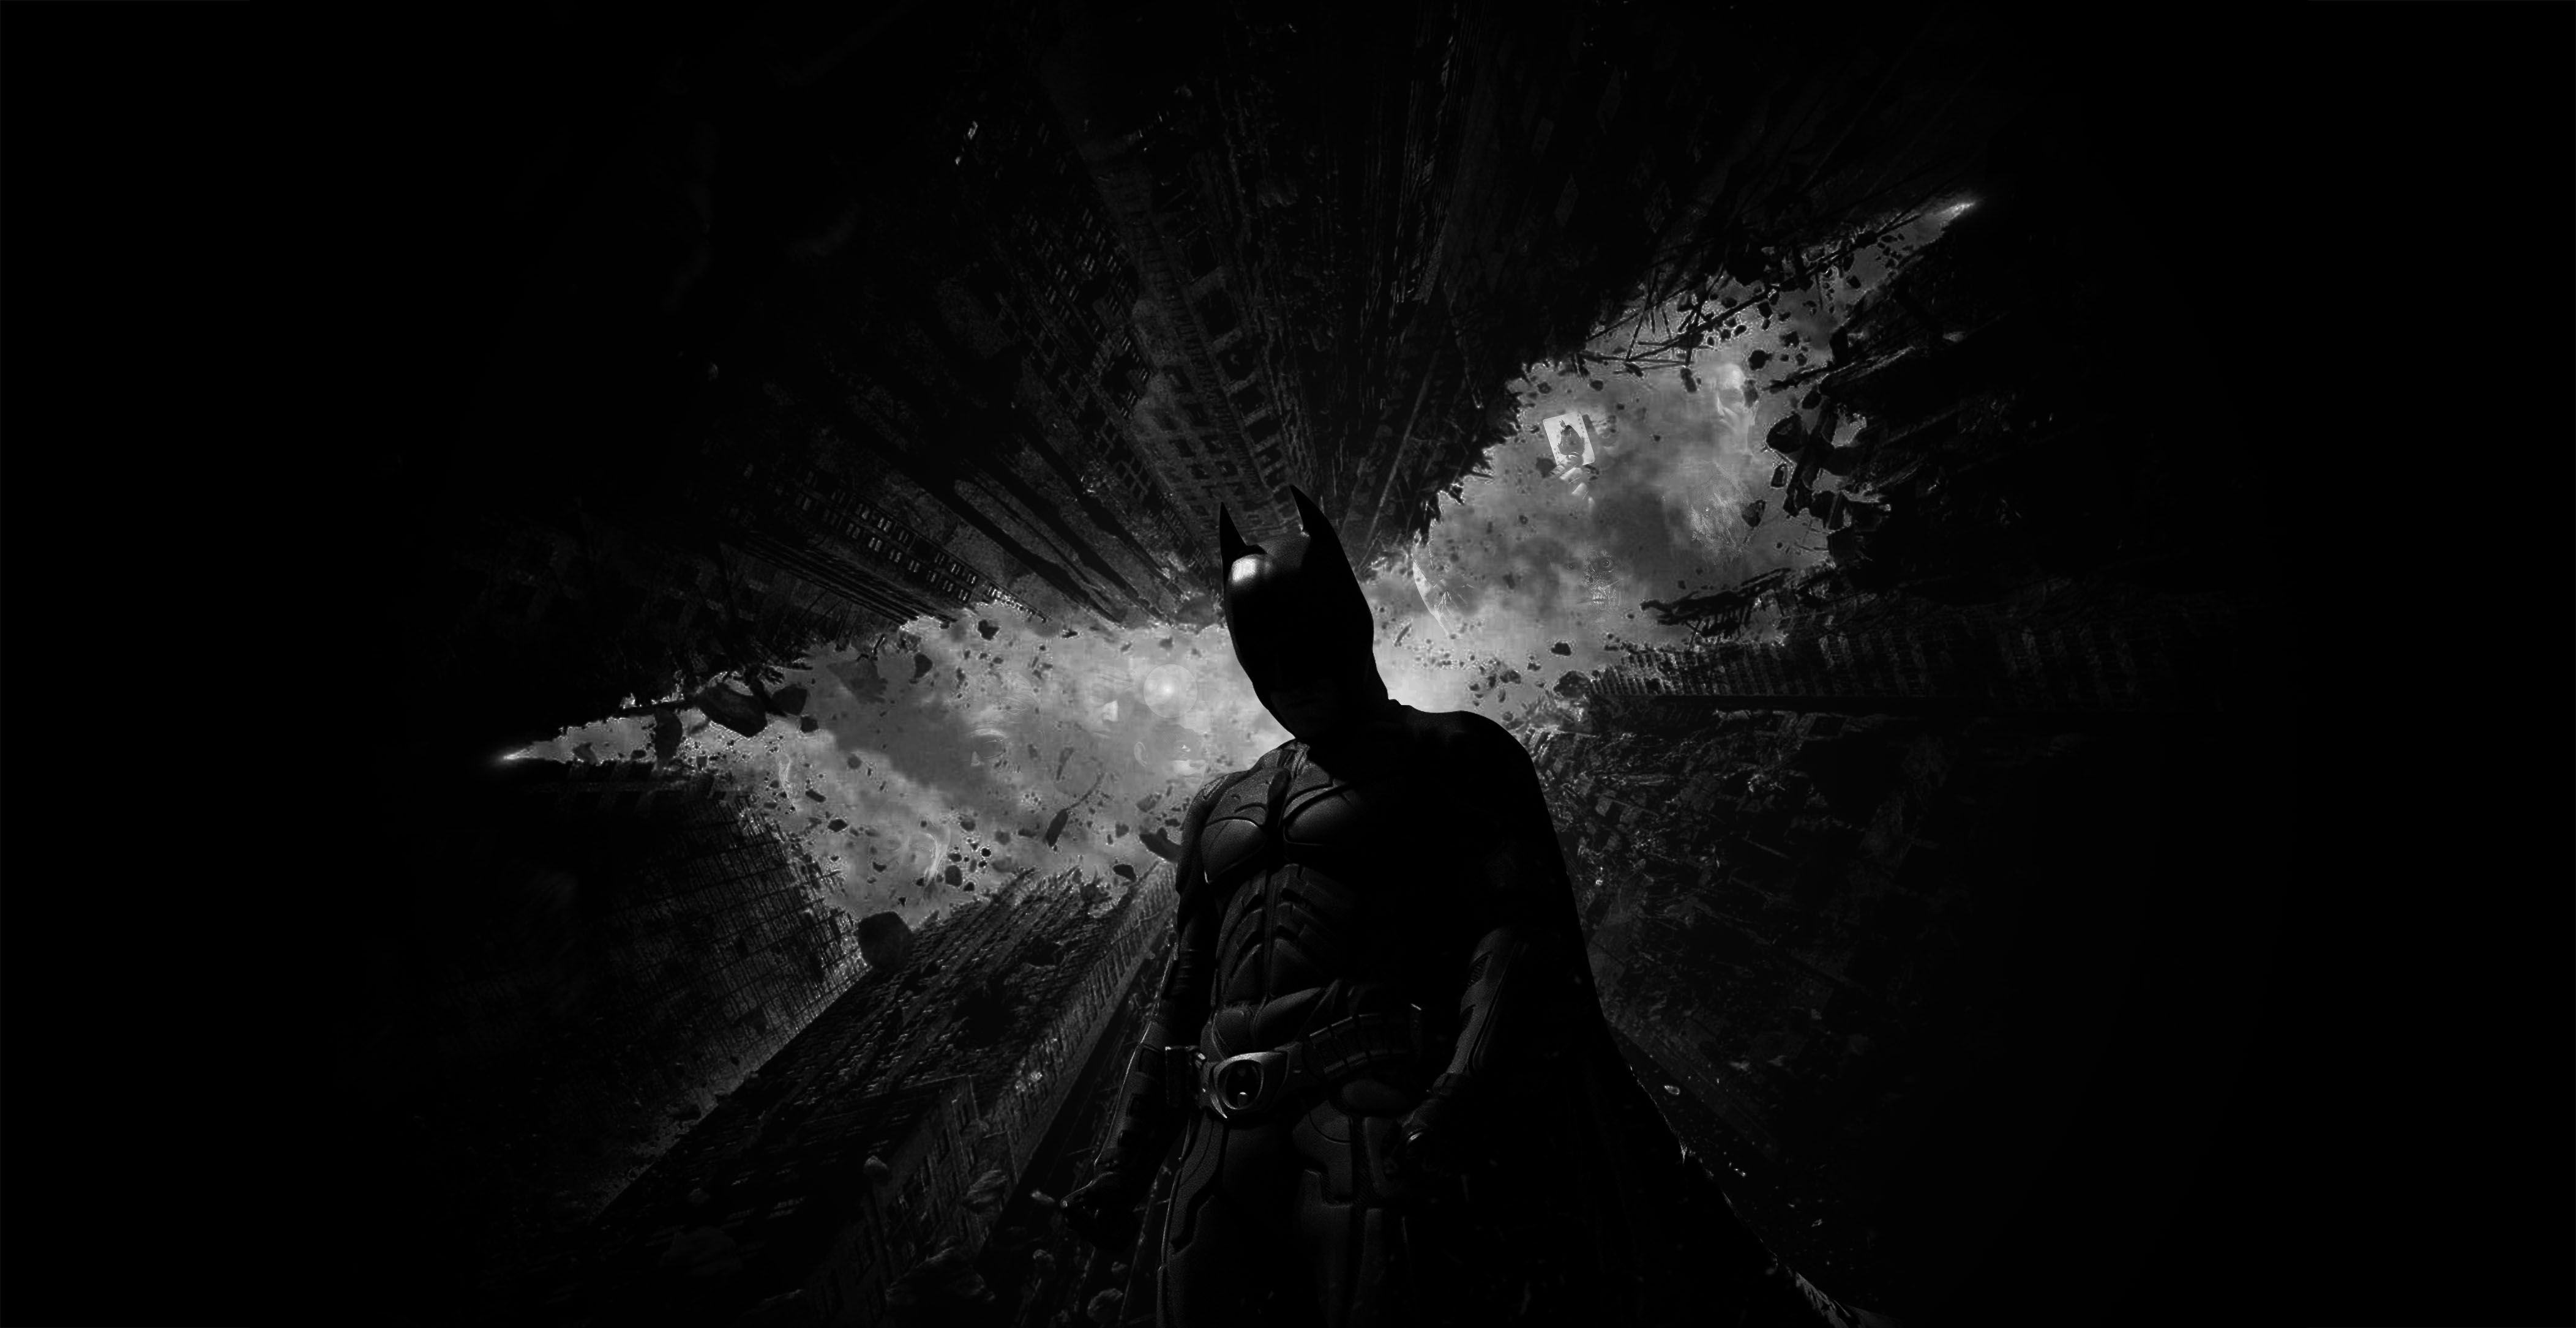 Batman The Dark Knight Wallpaper For Iphone For Desktop